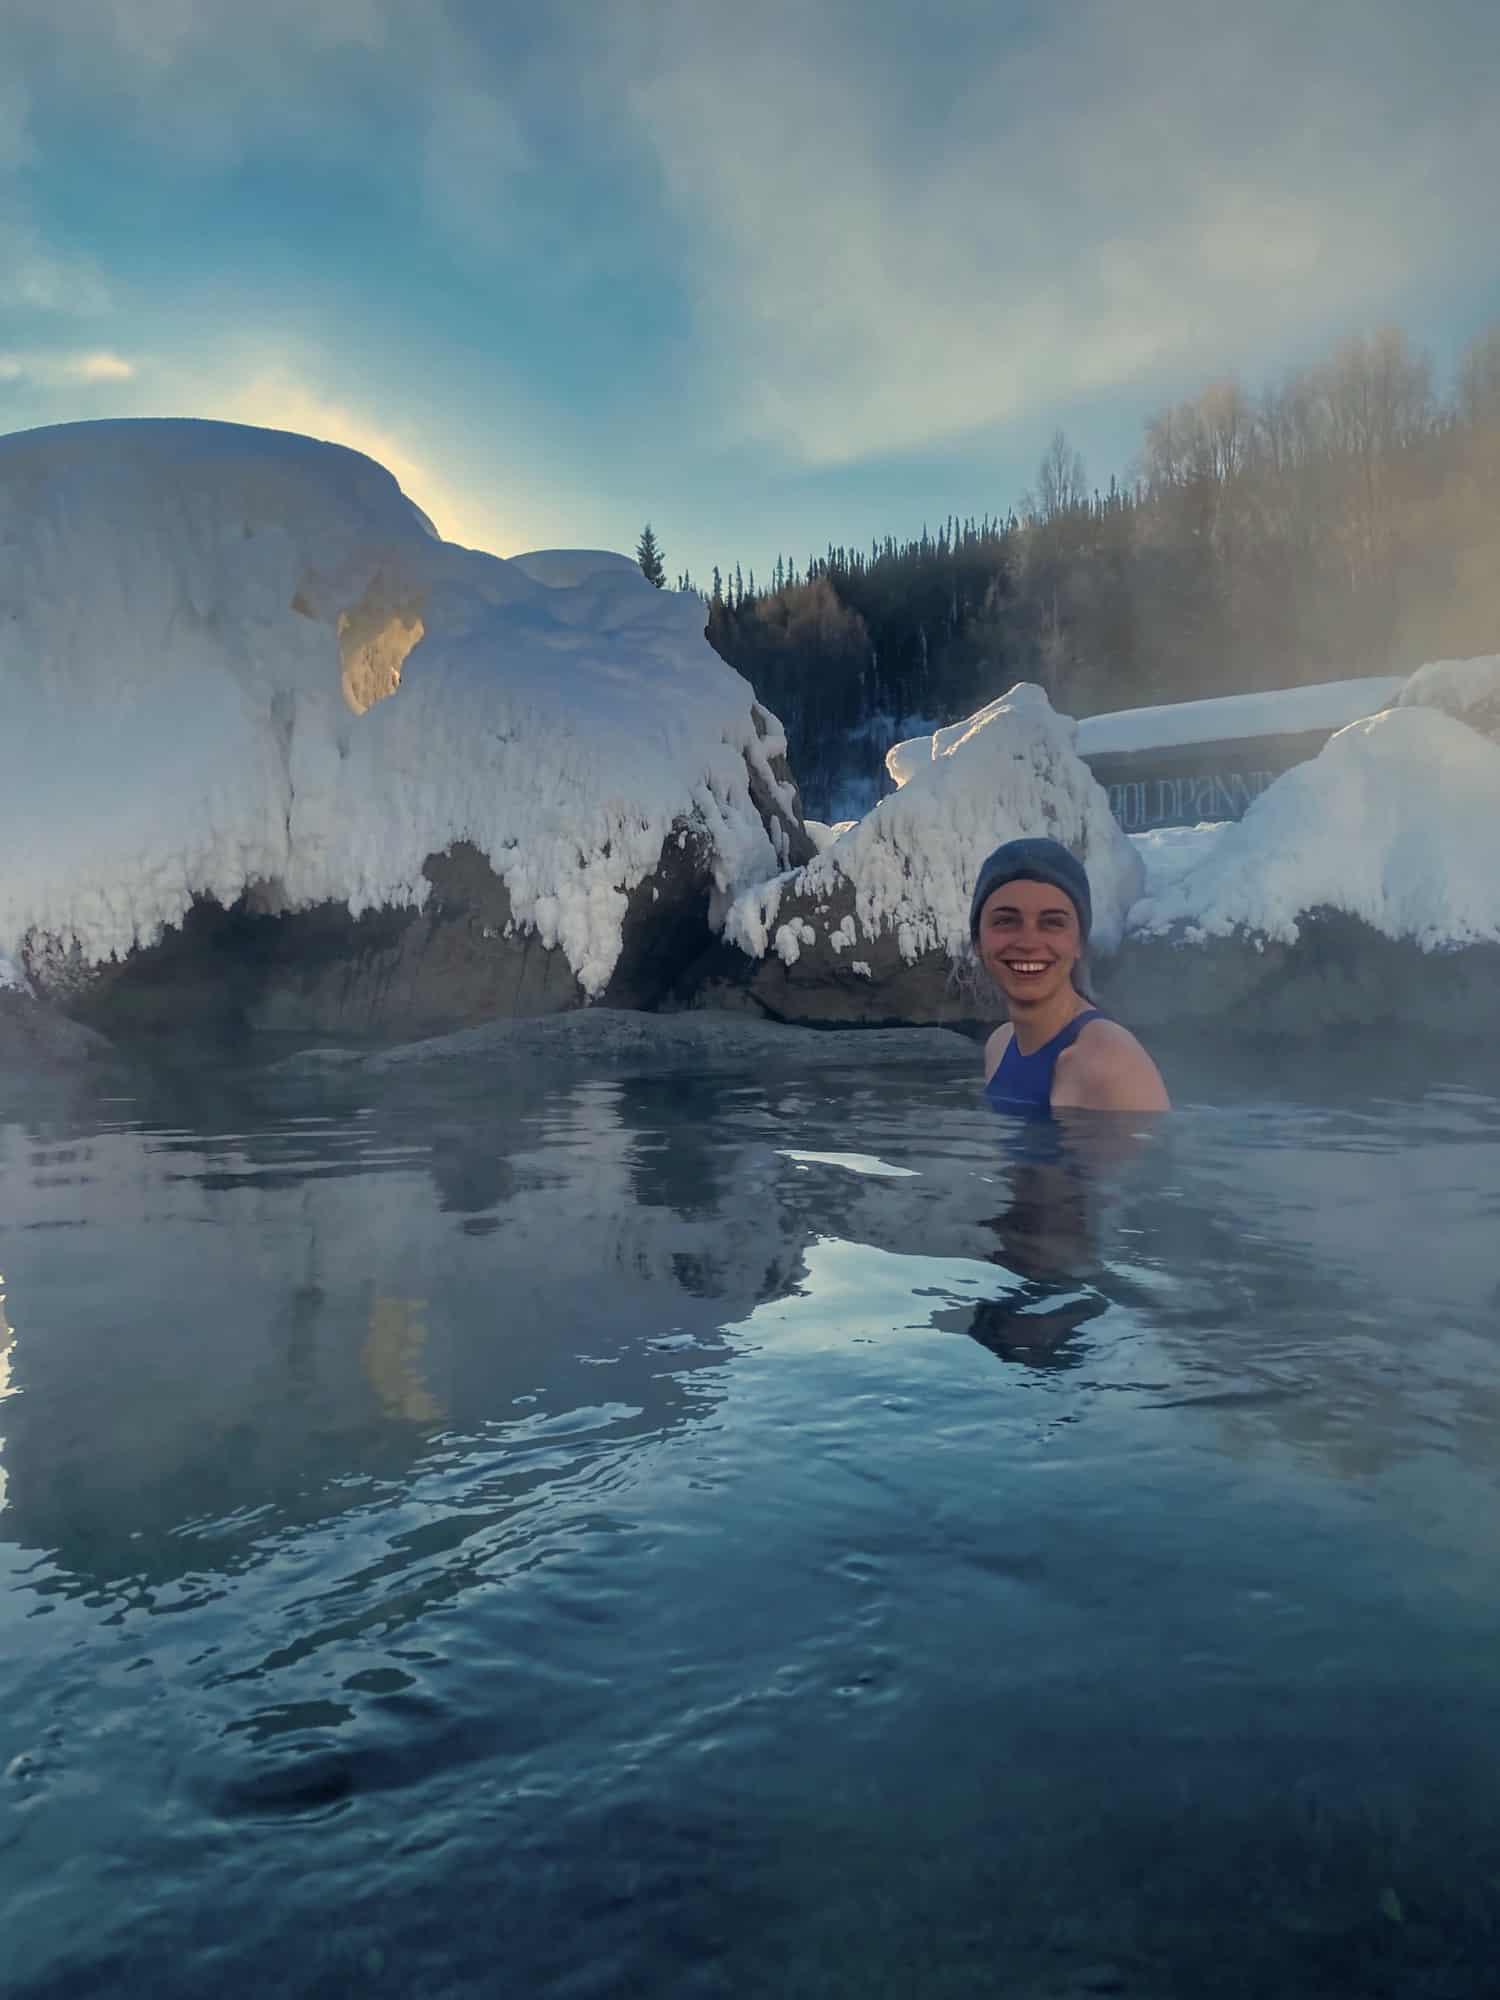 Fairbanks - Chena Hot Springs